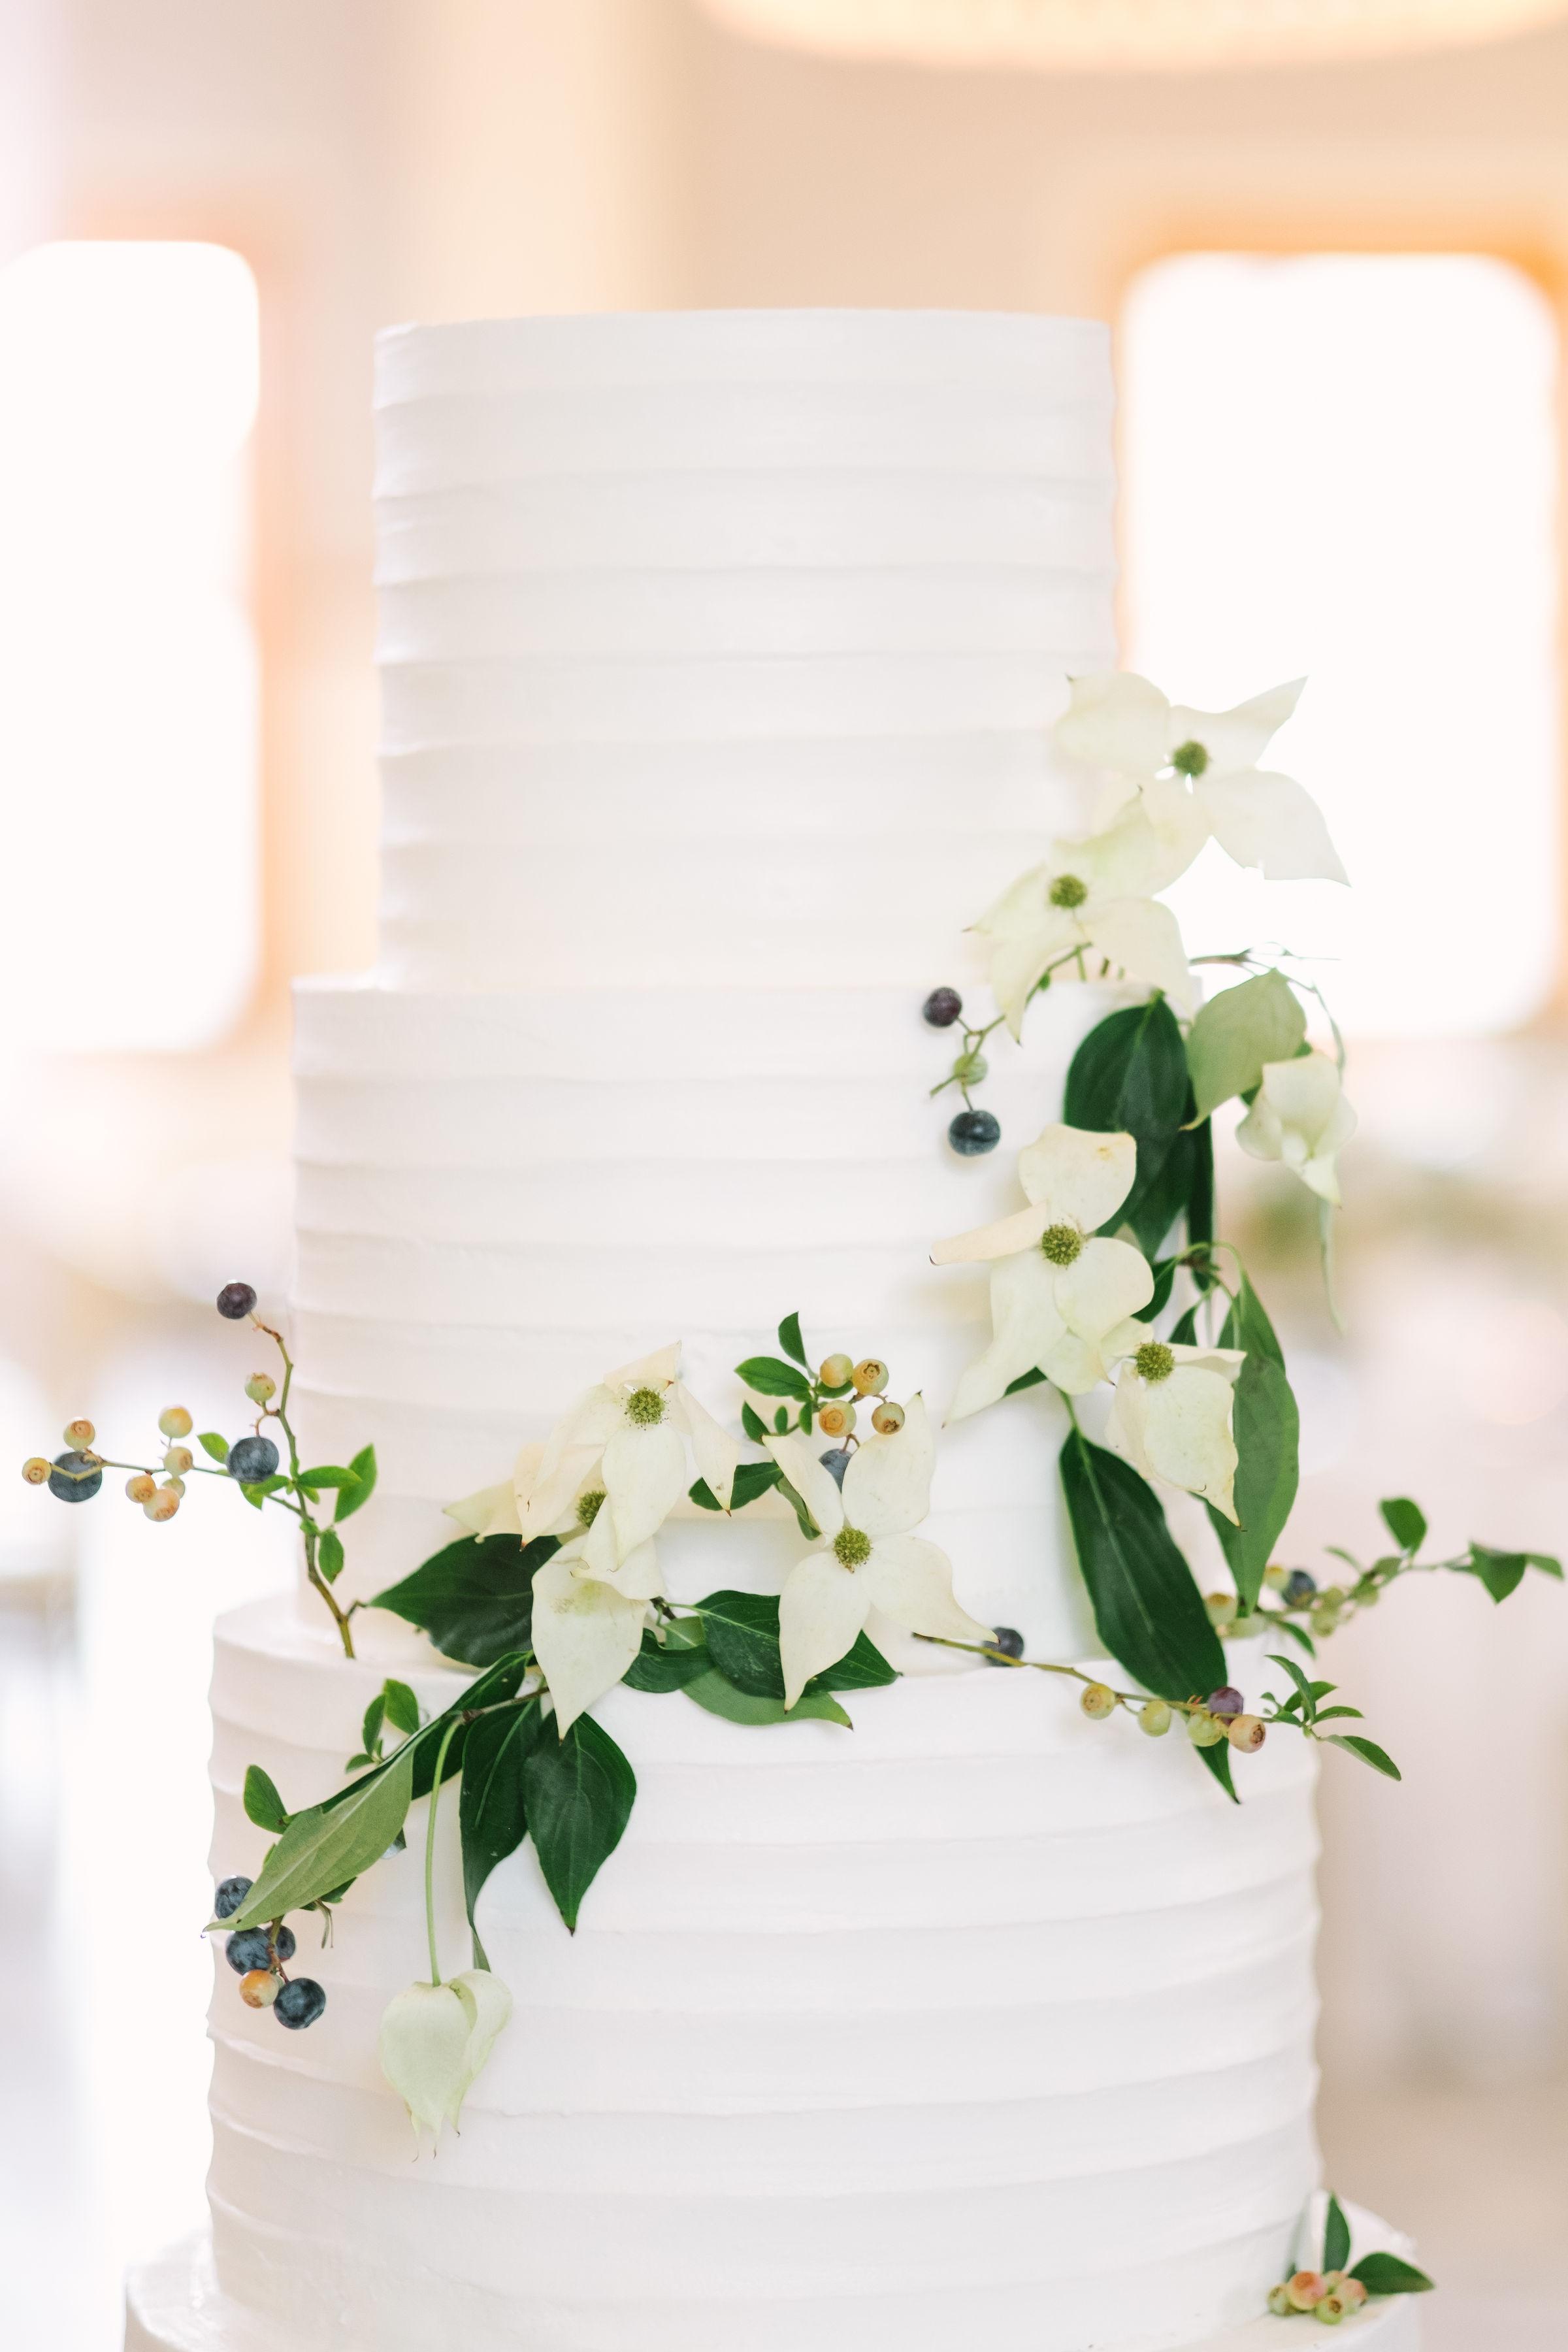 Ellen-Ashton-Photography-Girt-and-gold-events-weddings-Ashton-Depot-Weddings670.jpg